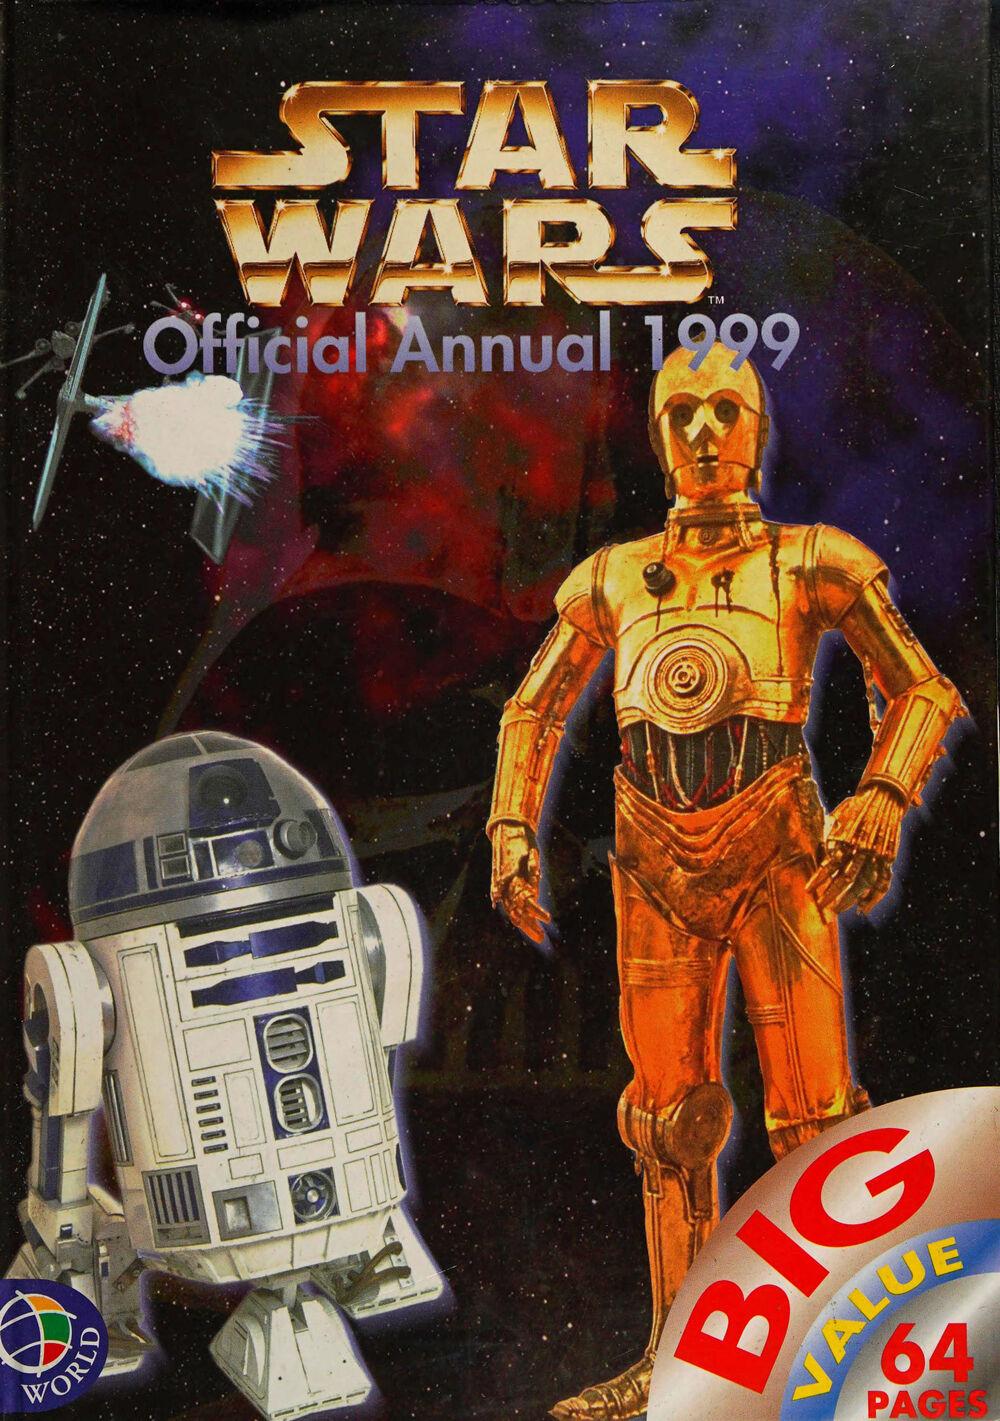 Star Wars Annual 1999